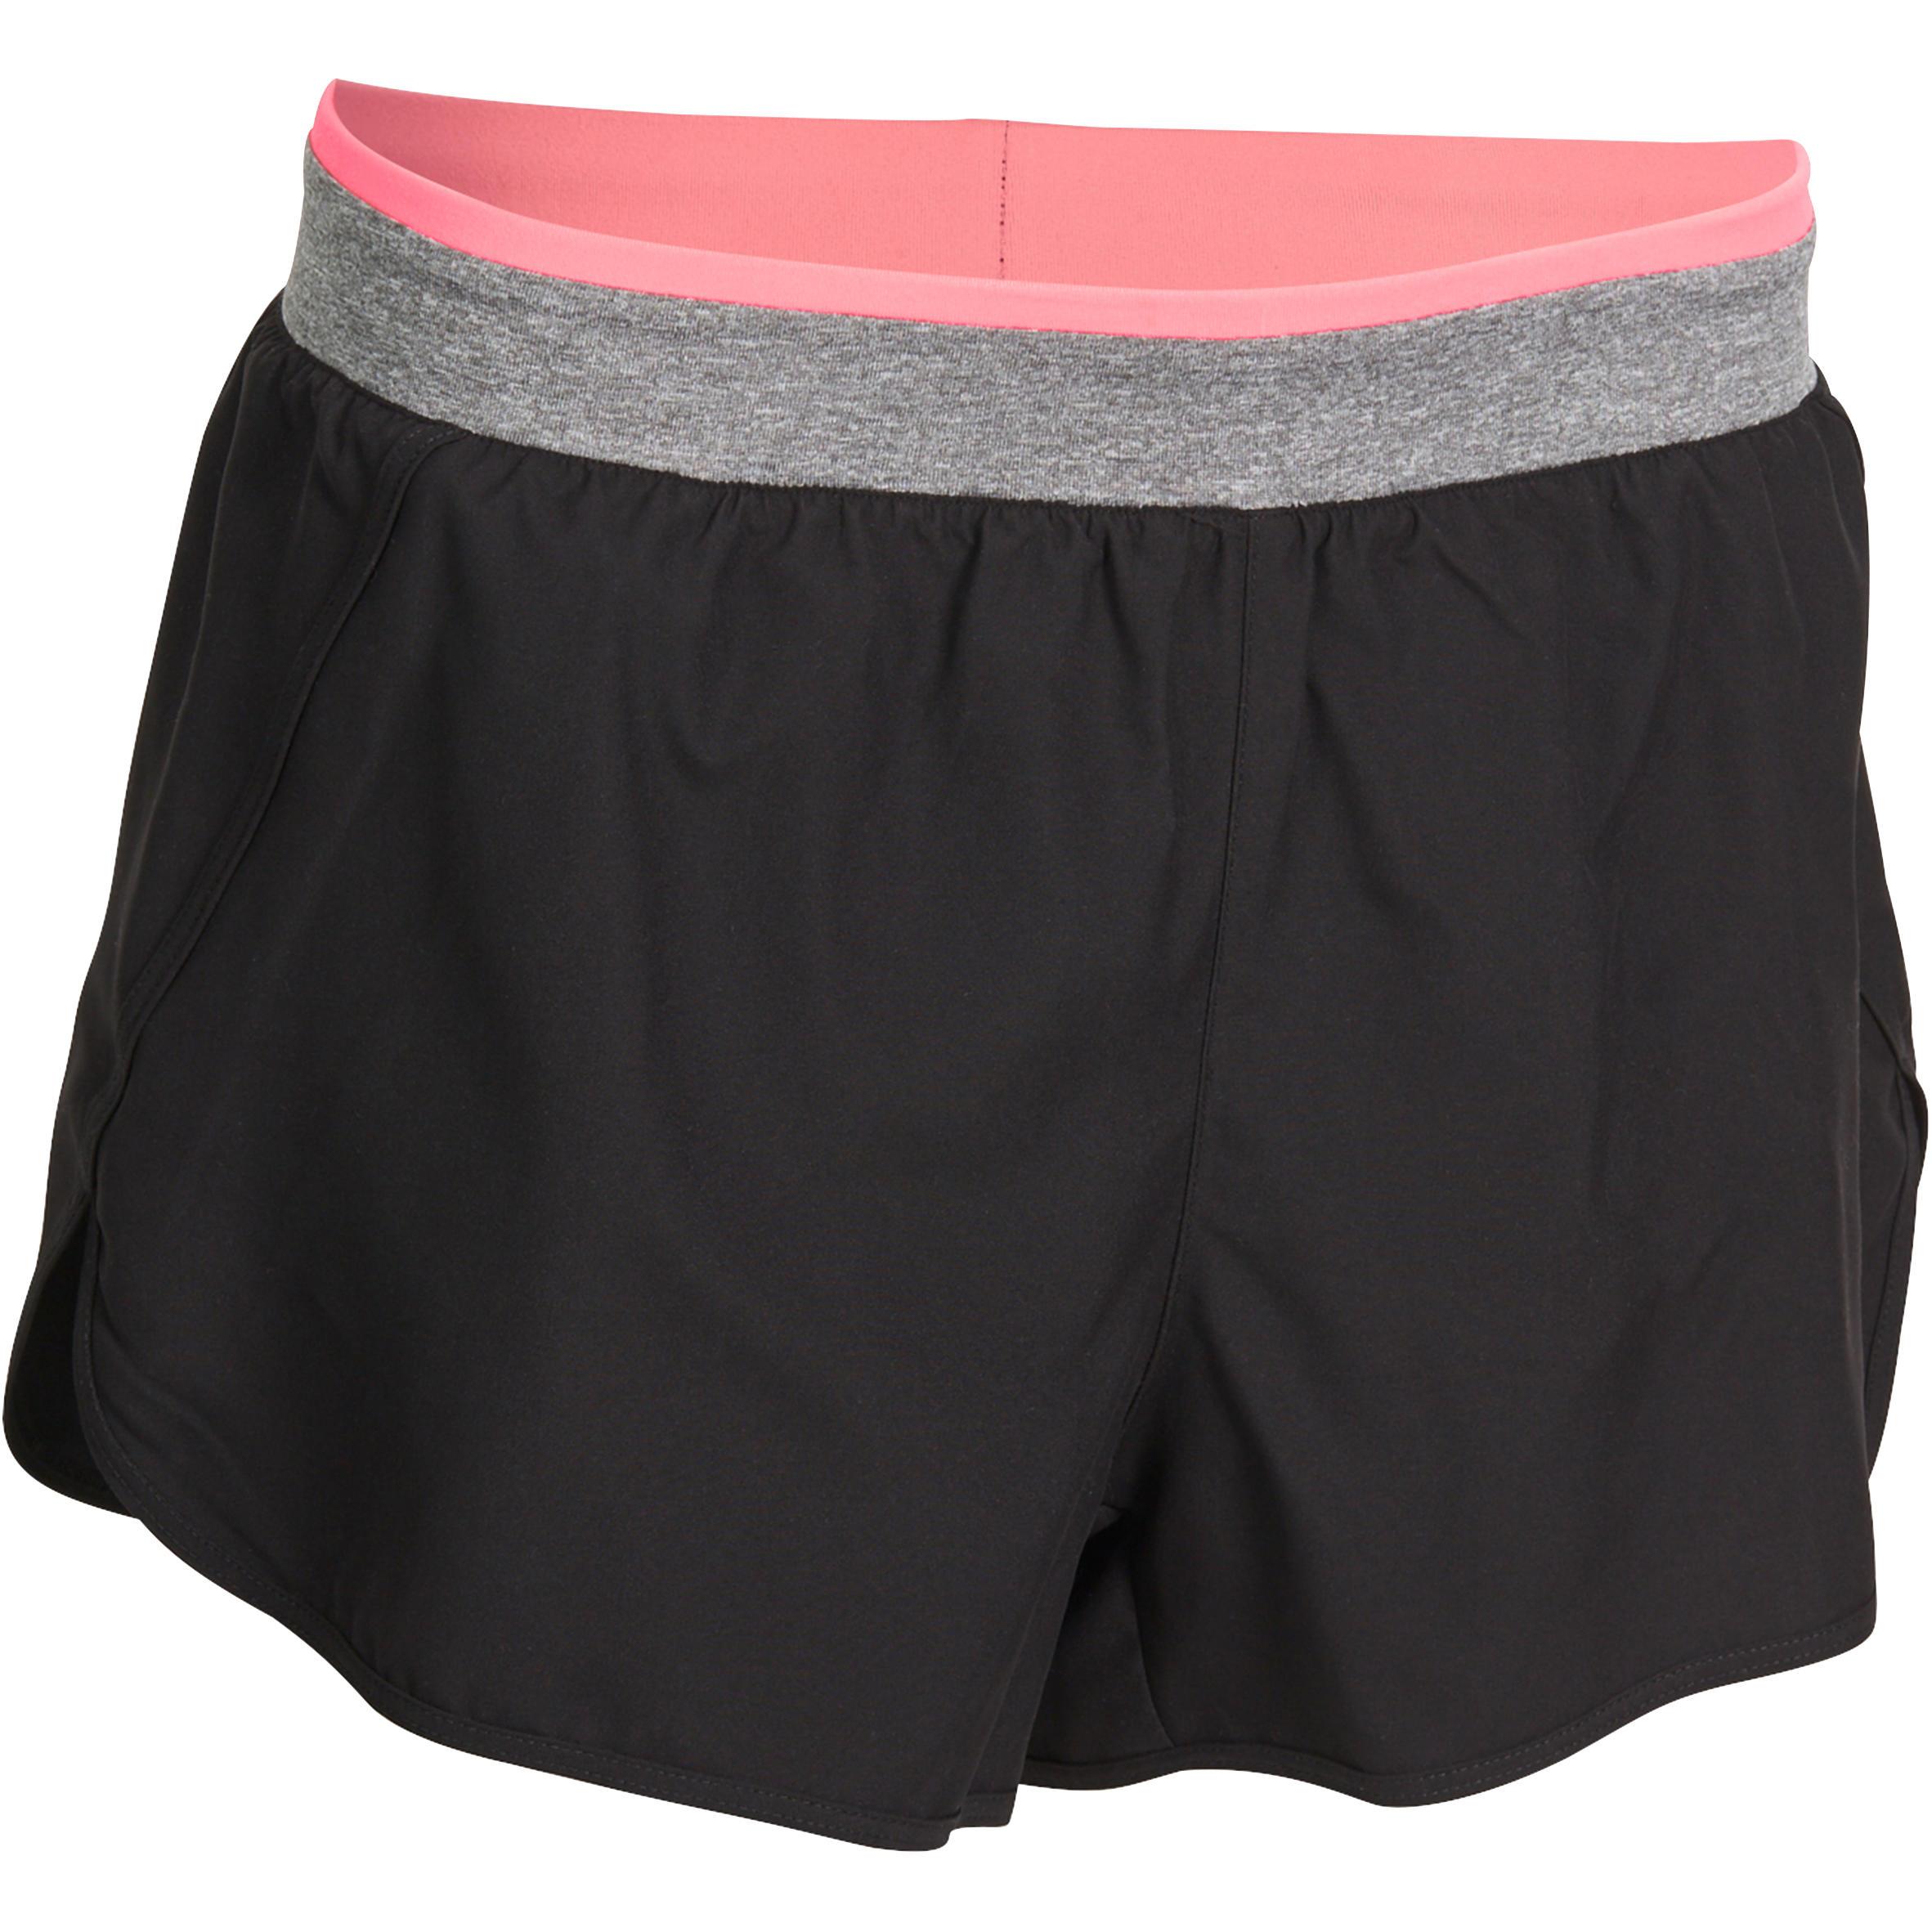 Pantalón corto ENERGY fitness mujer negro cintura a contraste